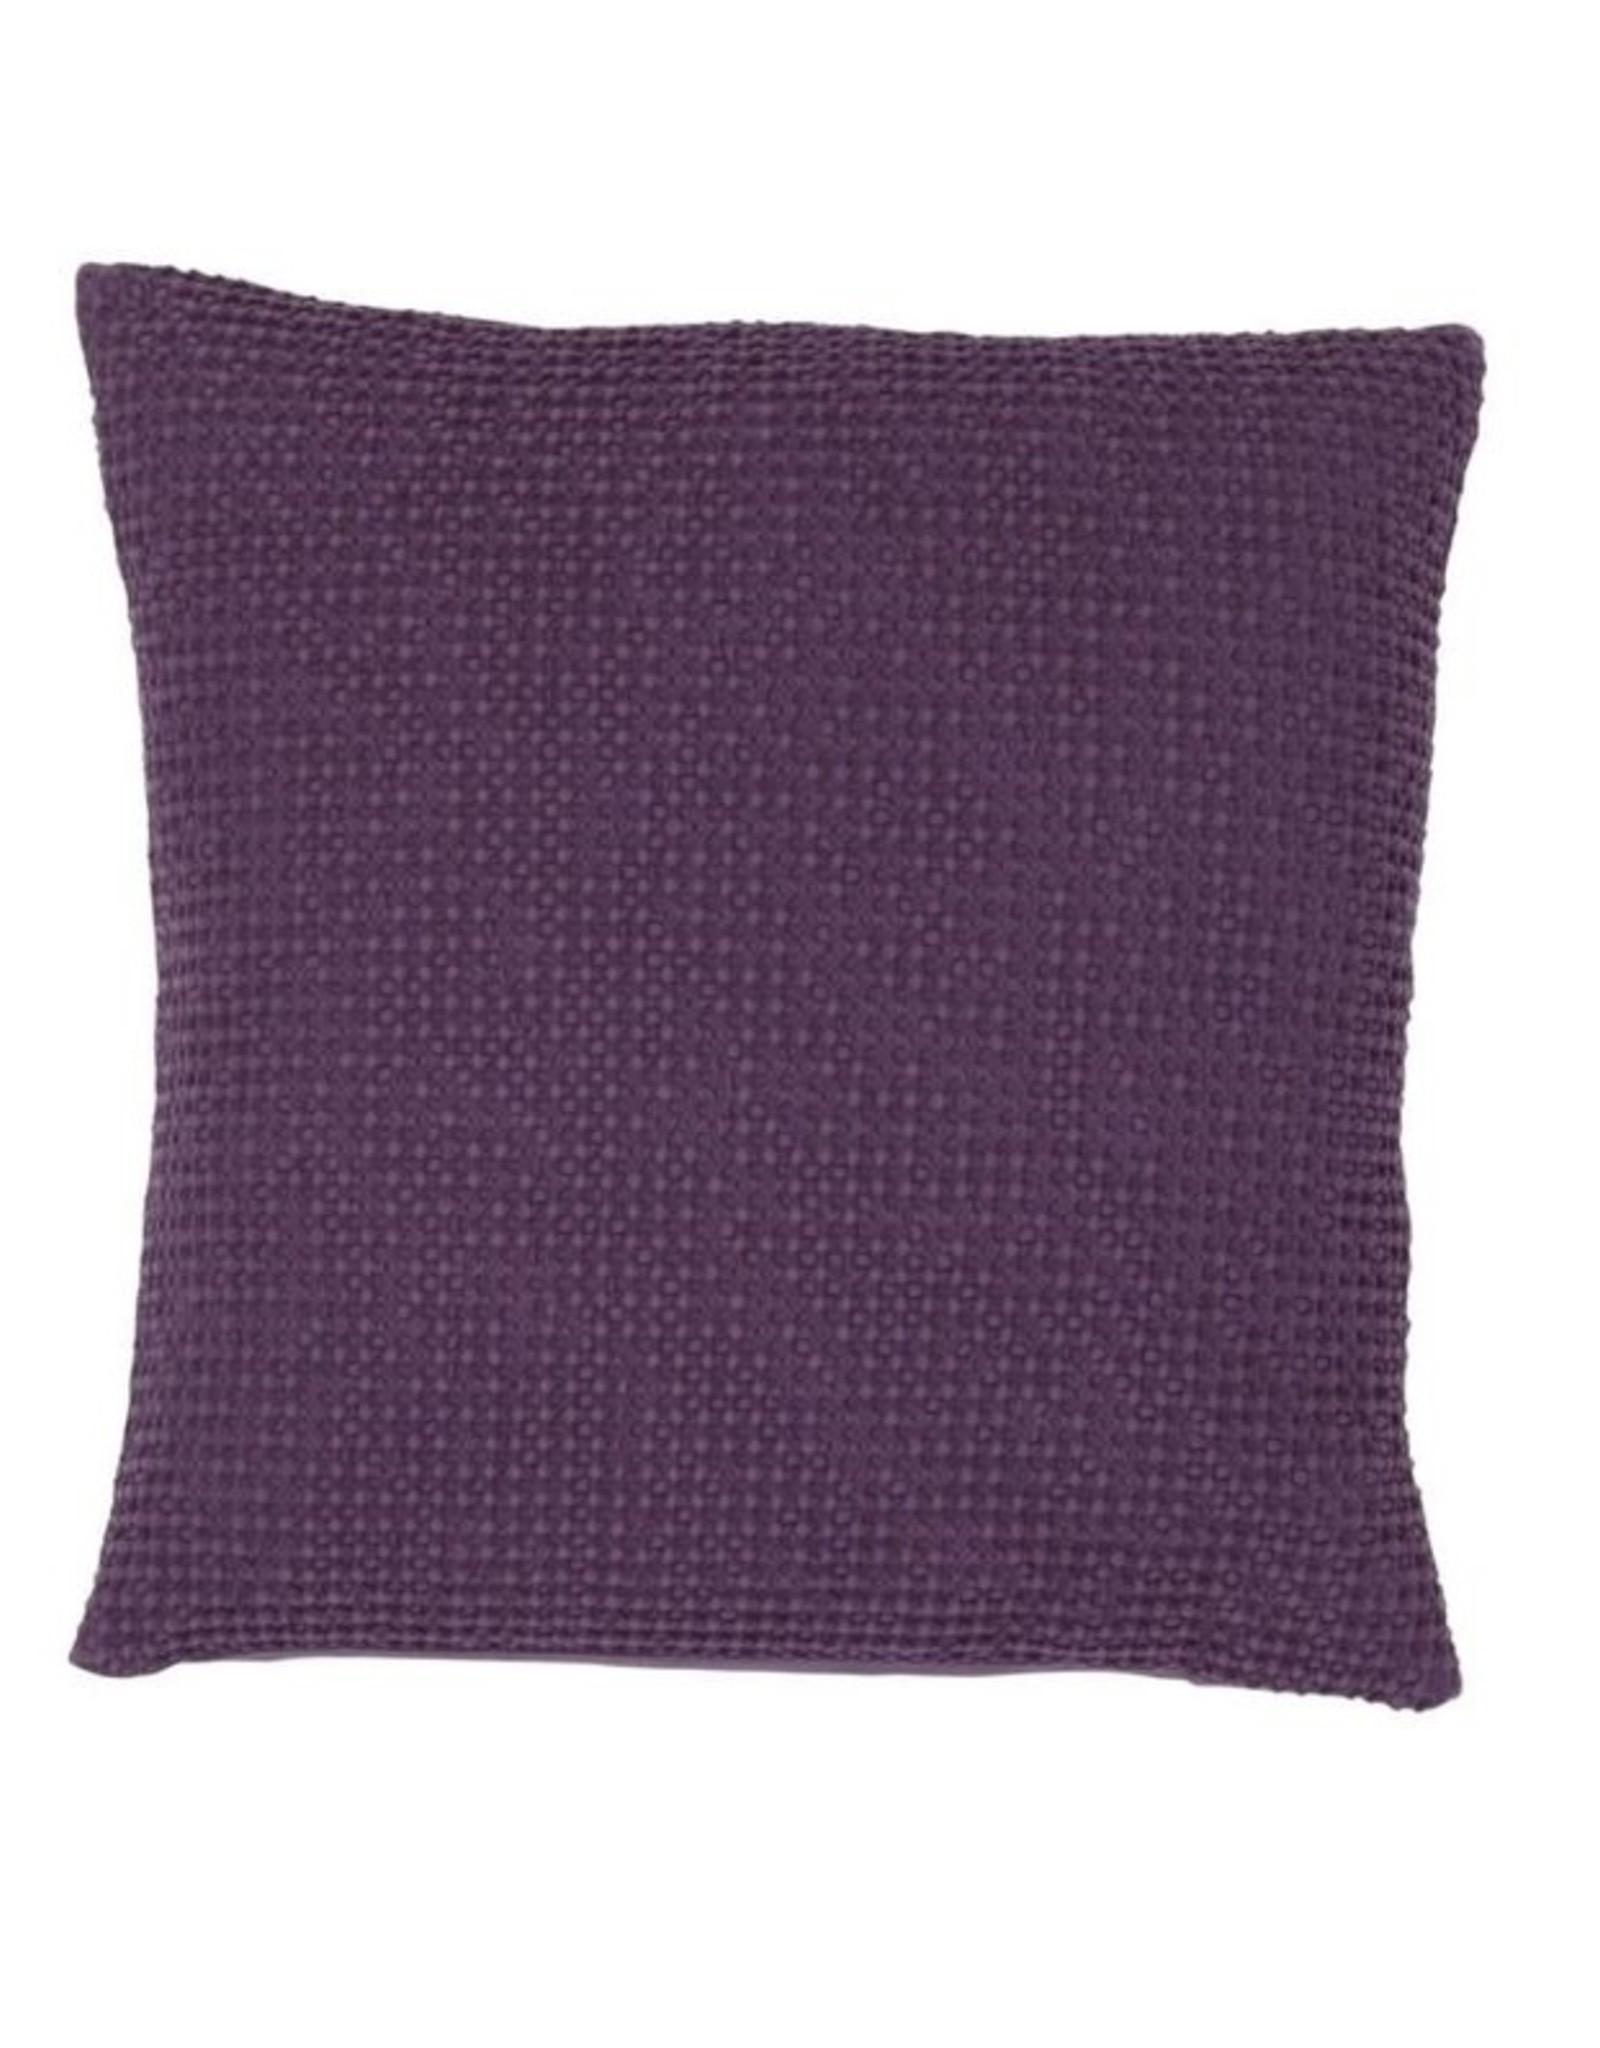 Vivaraise Sierkussen Maia violette 65/65